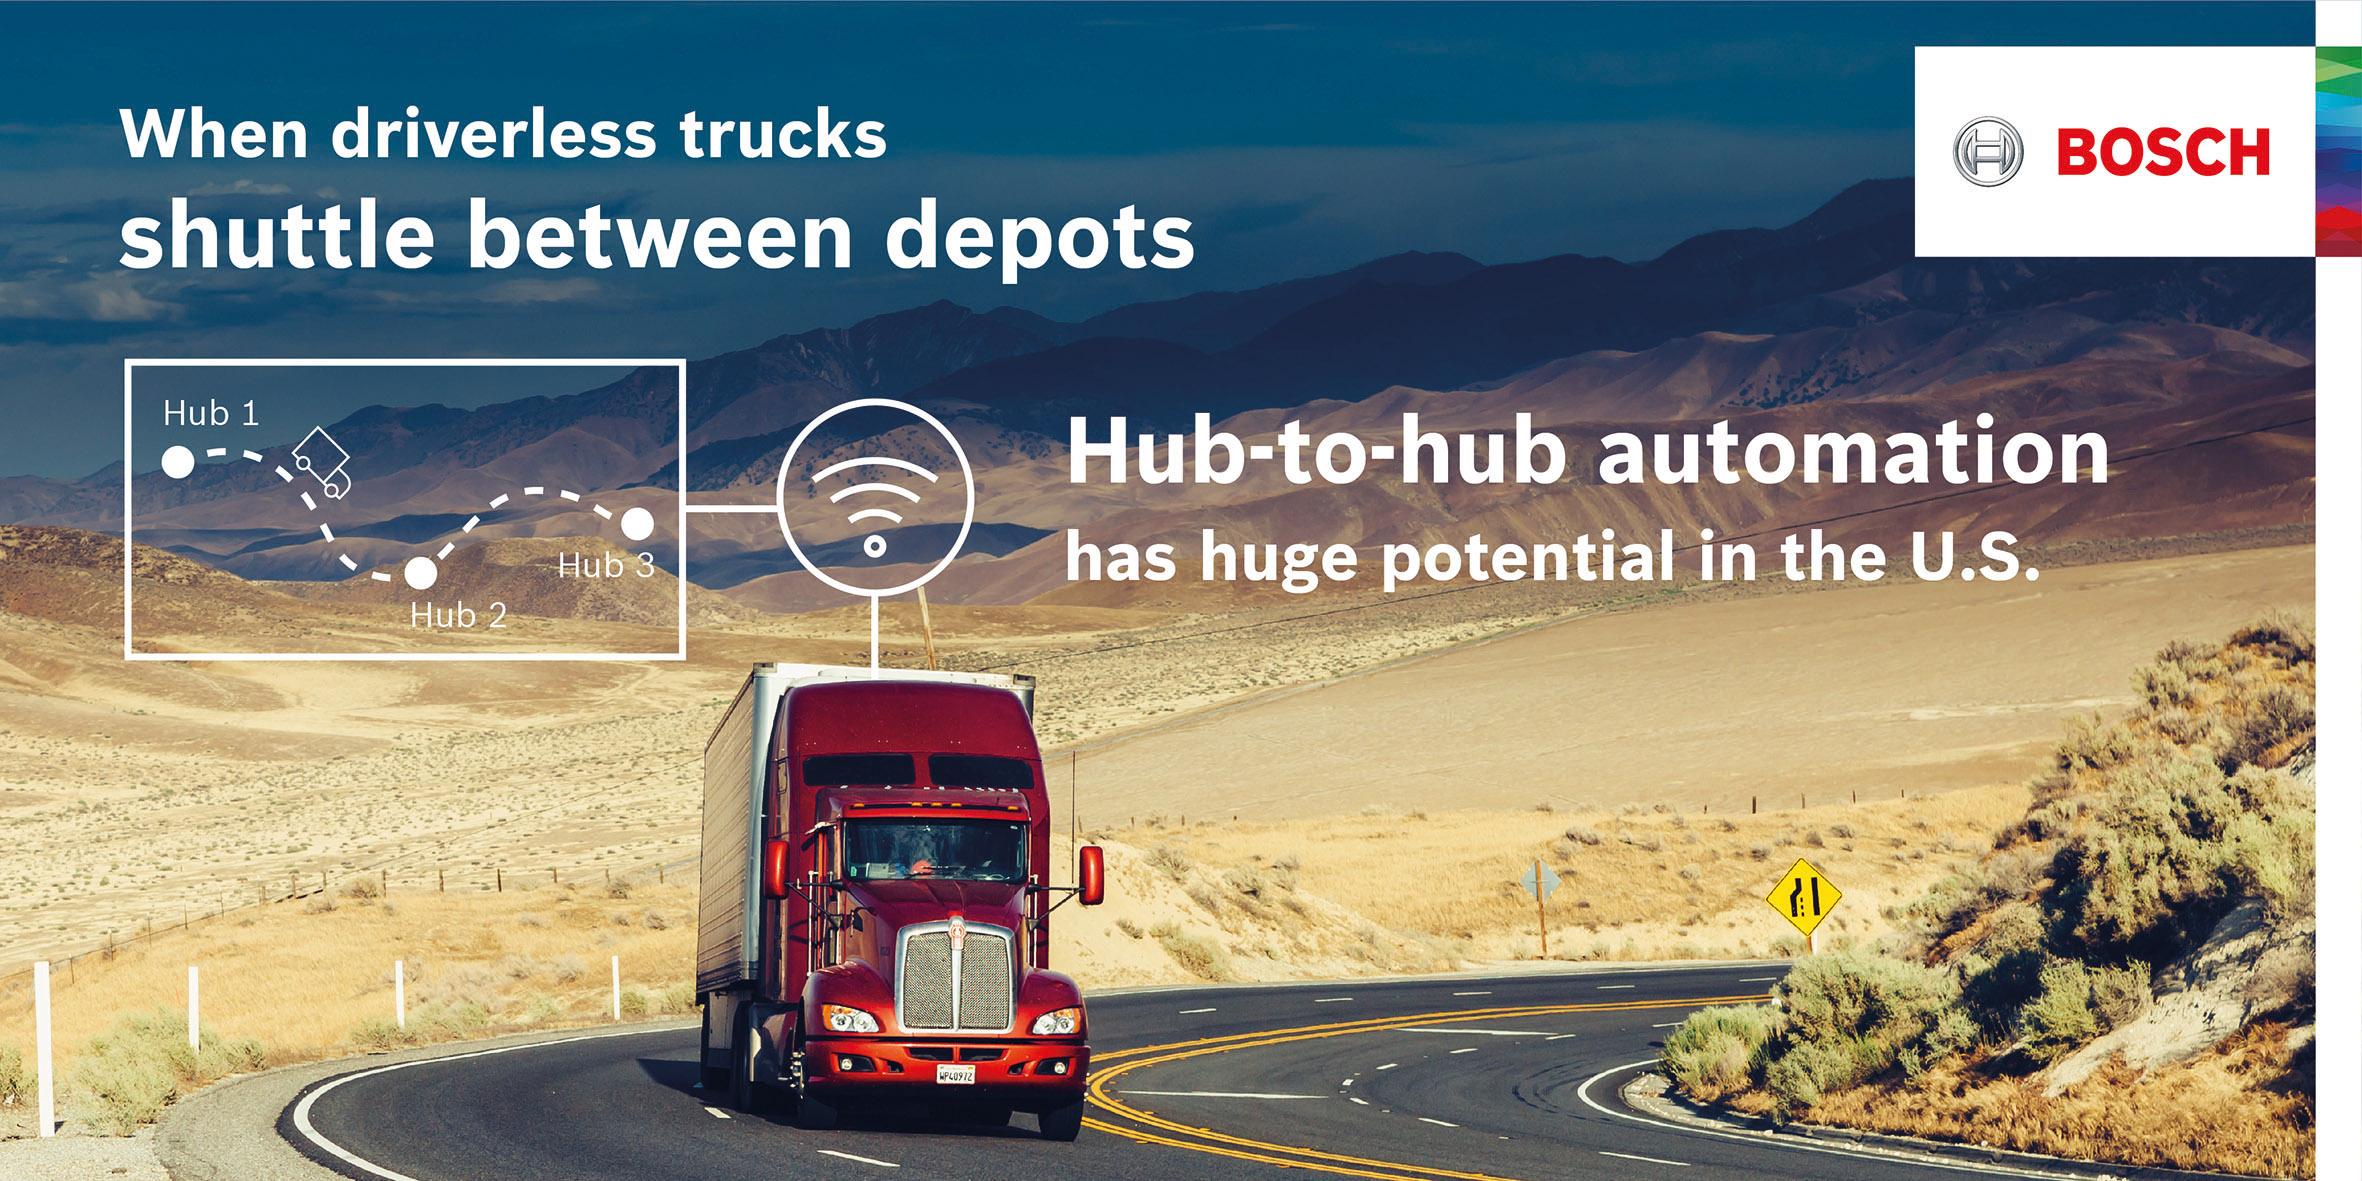 Hub-to-hub automatizace